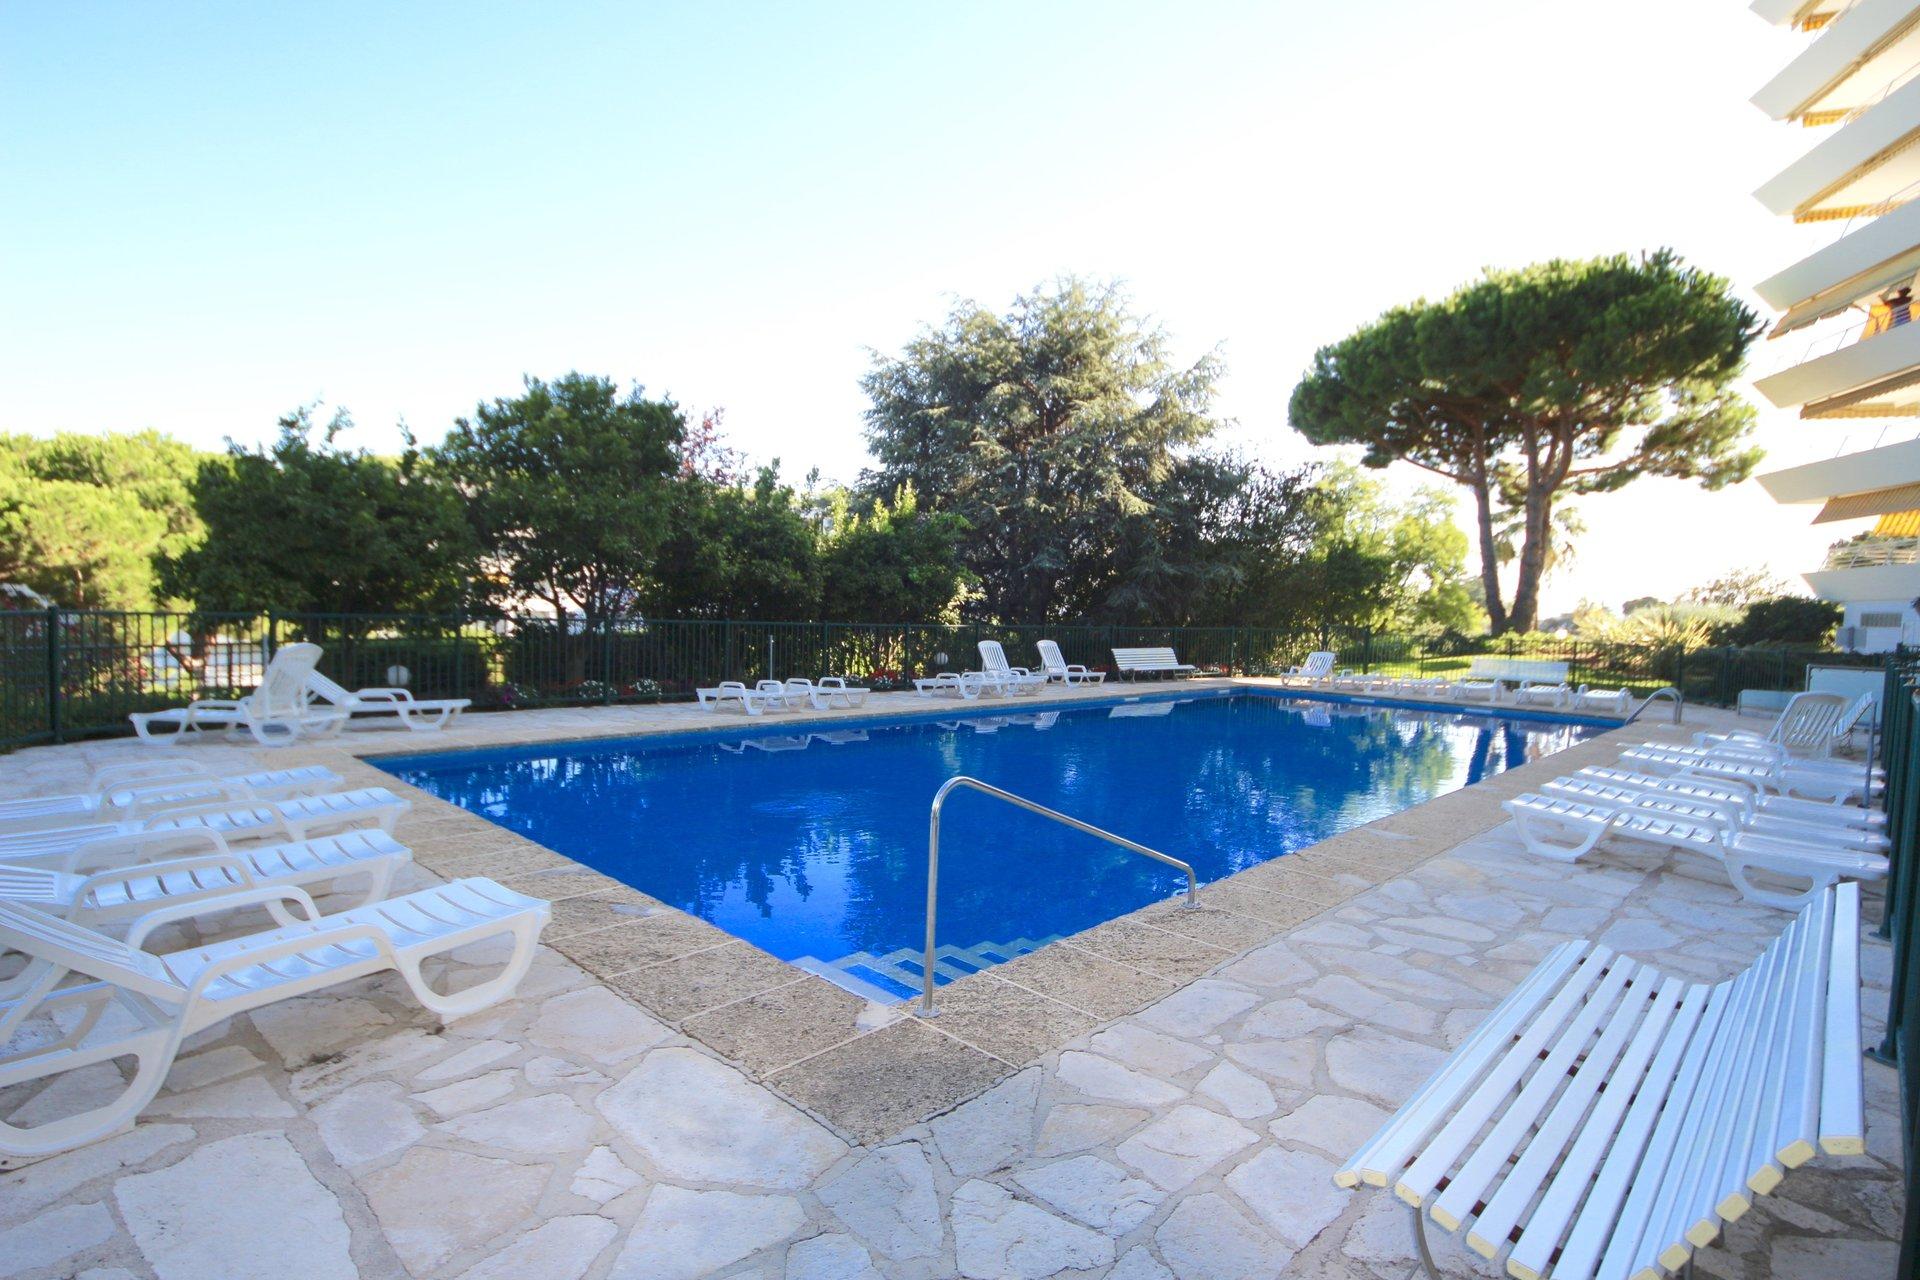 Cannes low Croix des Gardes, 2 bedrooms apartment , 74 sqm with sea view